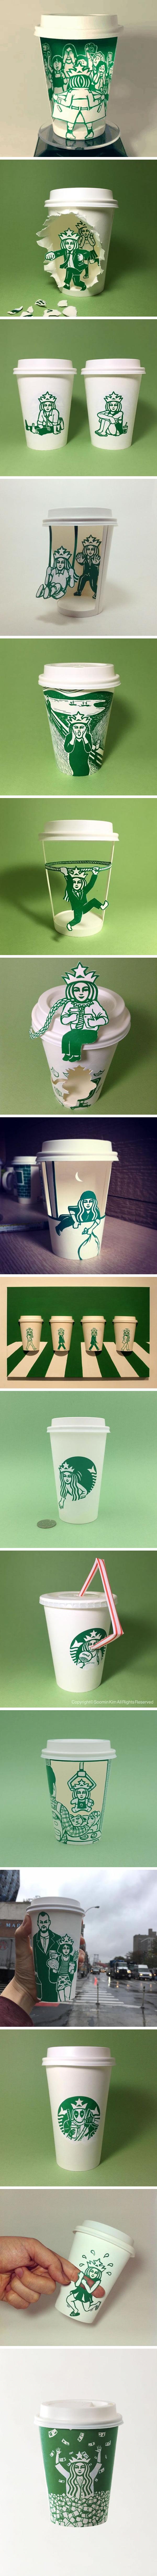 Artist Reveals The Mysterious Hidden Life Of Starbucks' Mermaid